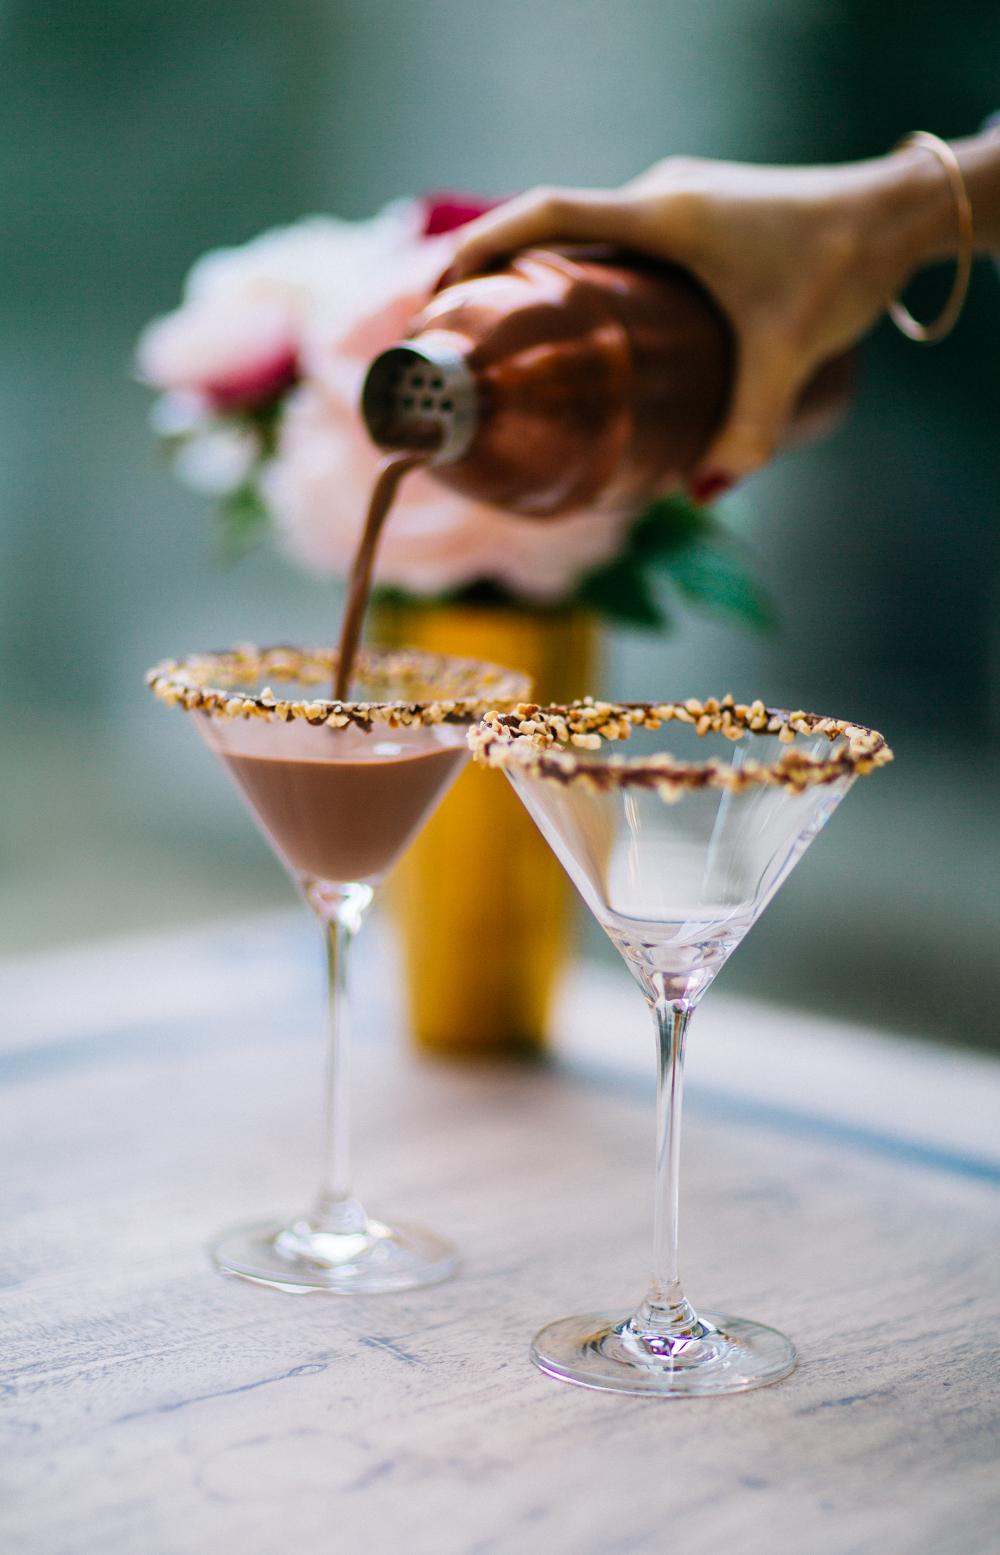 Master the basic Cocktail techniques (part 3)